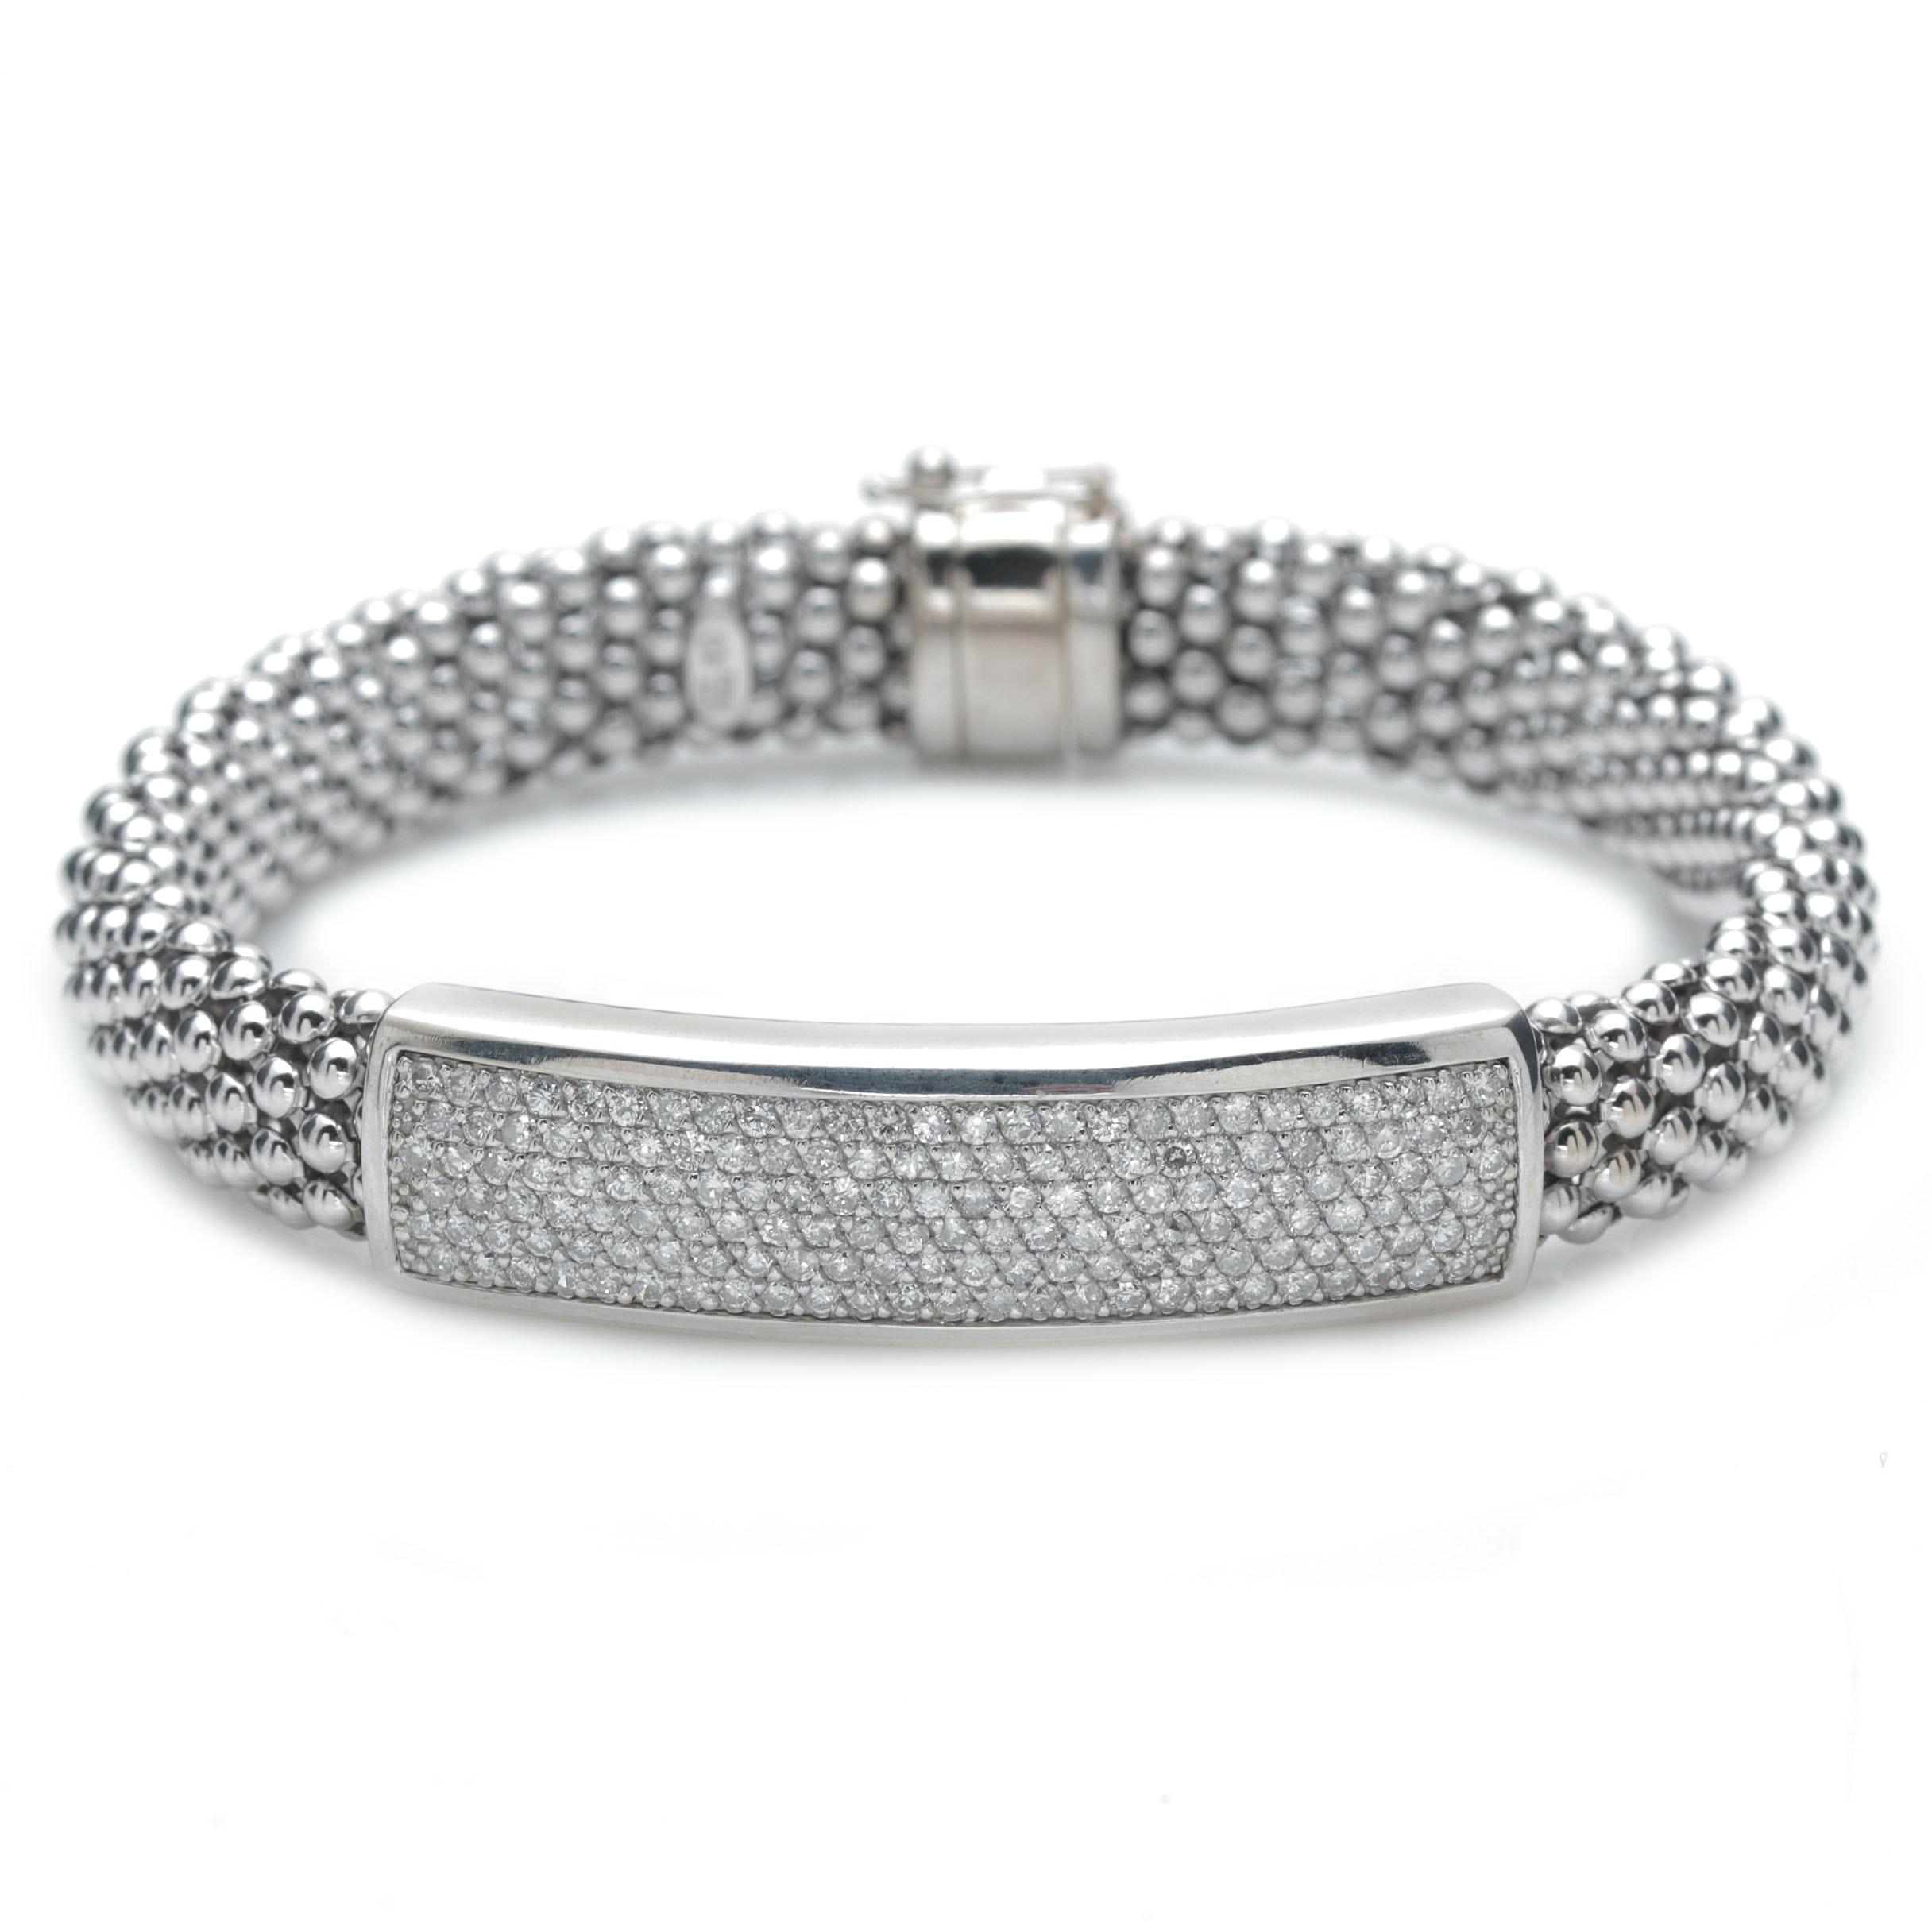 14K White Gold and 2.24 CTW Diamond Bracelet